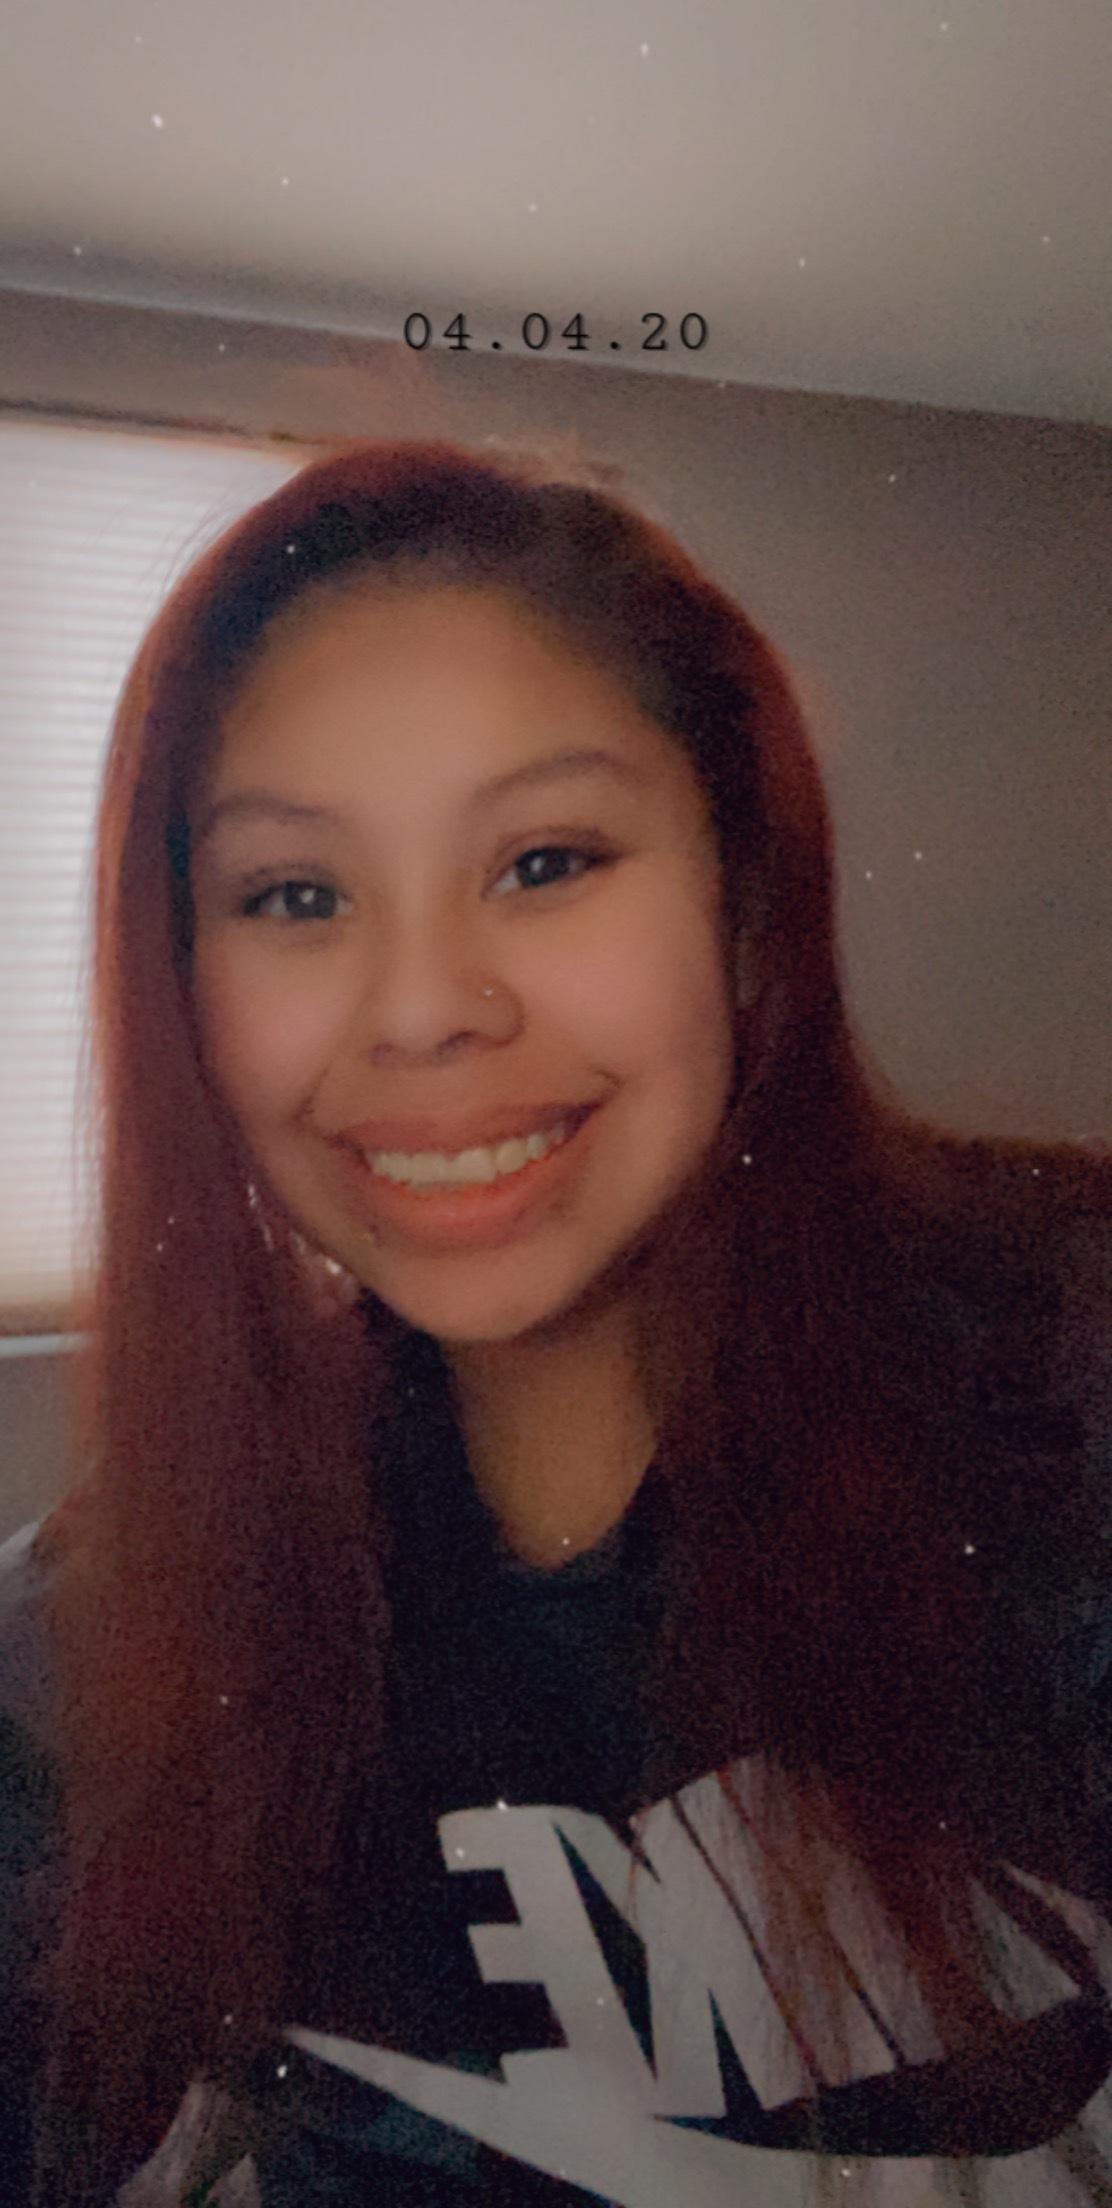 21-year-old, Single From: Edmonton , Alberta, Canada